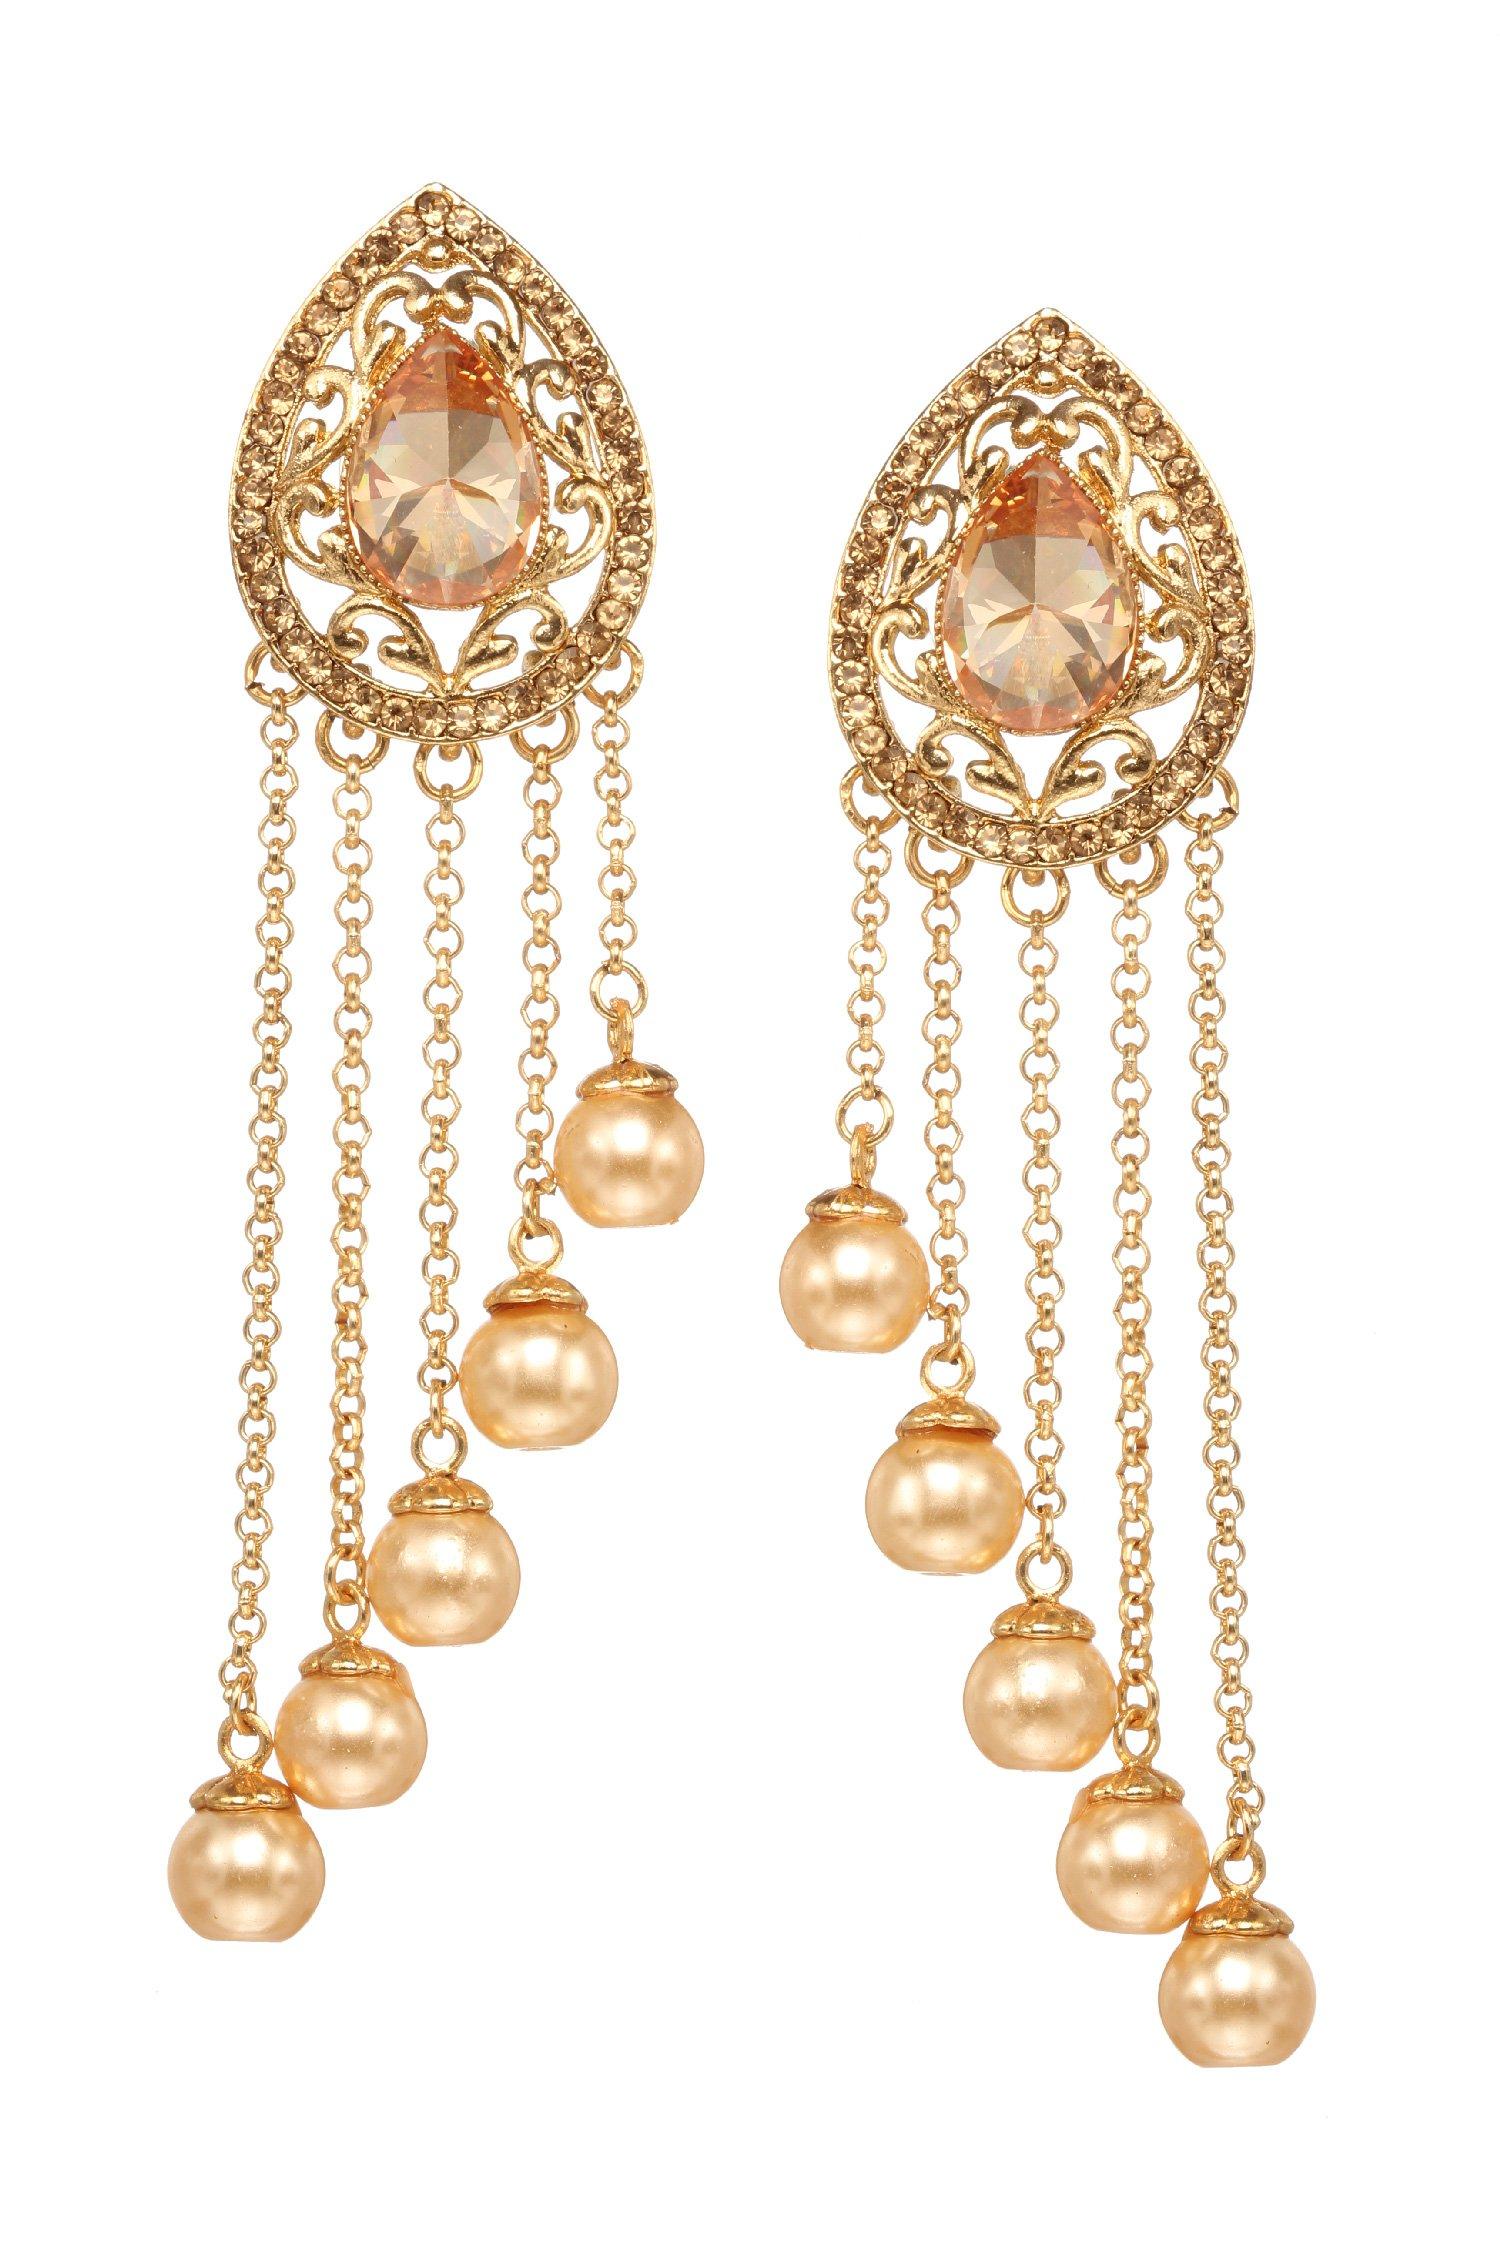 Bindhani Quality Indian Jewelry Bollywood Style Wedding Chandbali Bahubali Chain Pearl Earrings For Women